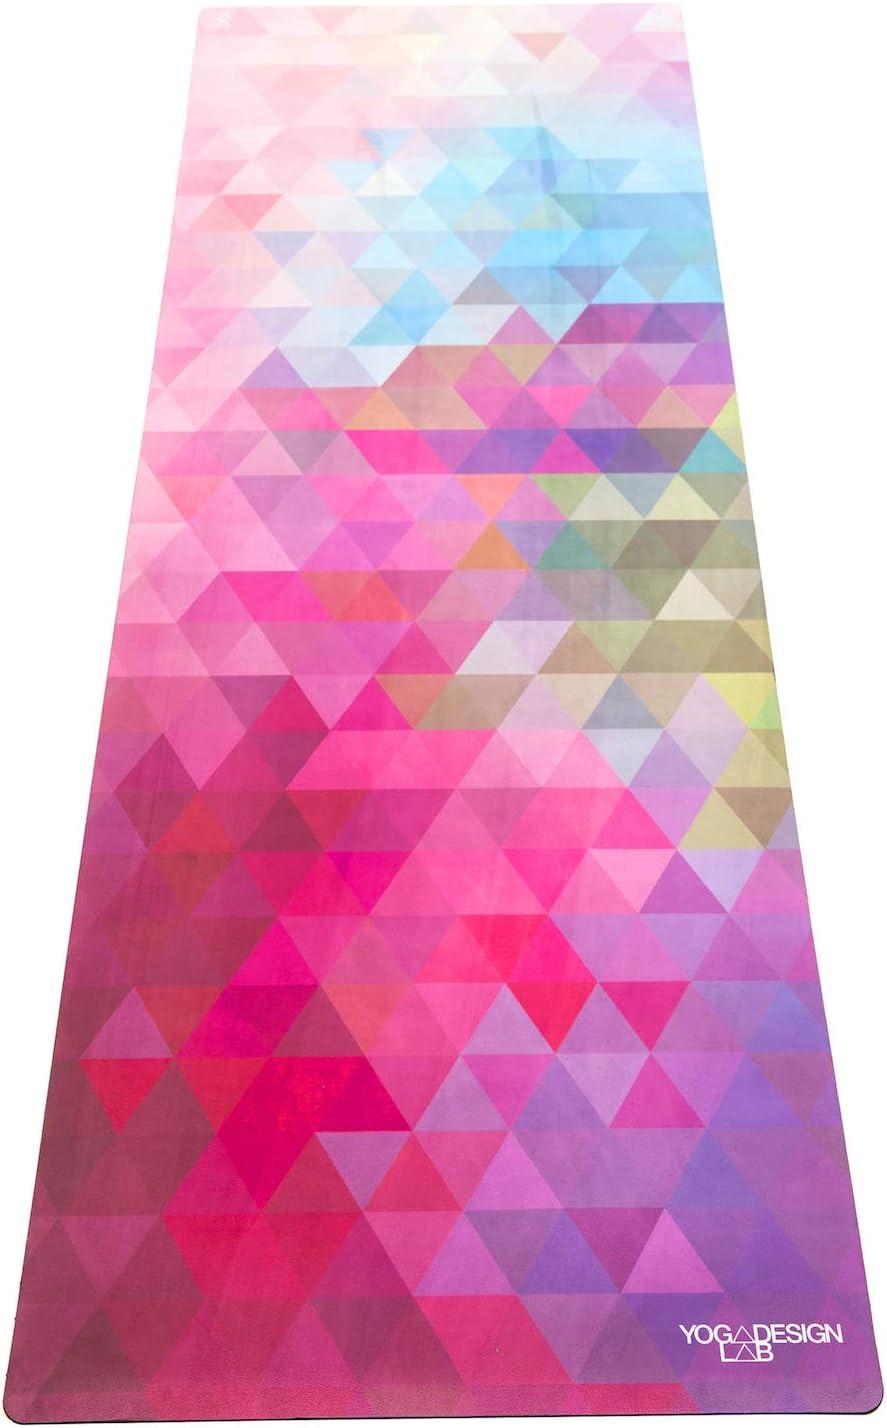 Yoga Design LAB | The Combo Yoga MAT | 2-in-1 Mat+Towel | Eco Luxury | Ideal for Hot Yoga, Power, Bikram, Ashtanga, Sweat | Studio Quality | Includes Carrying Strap!